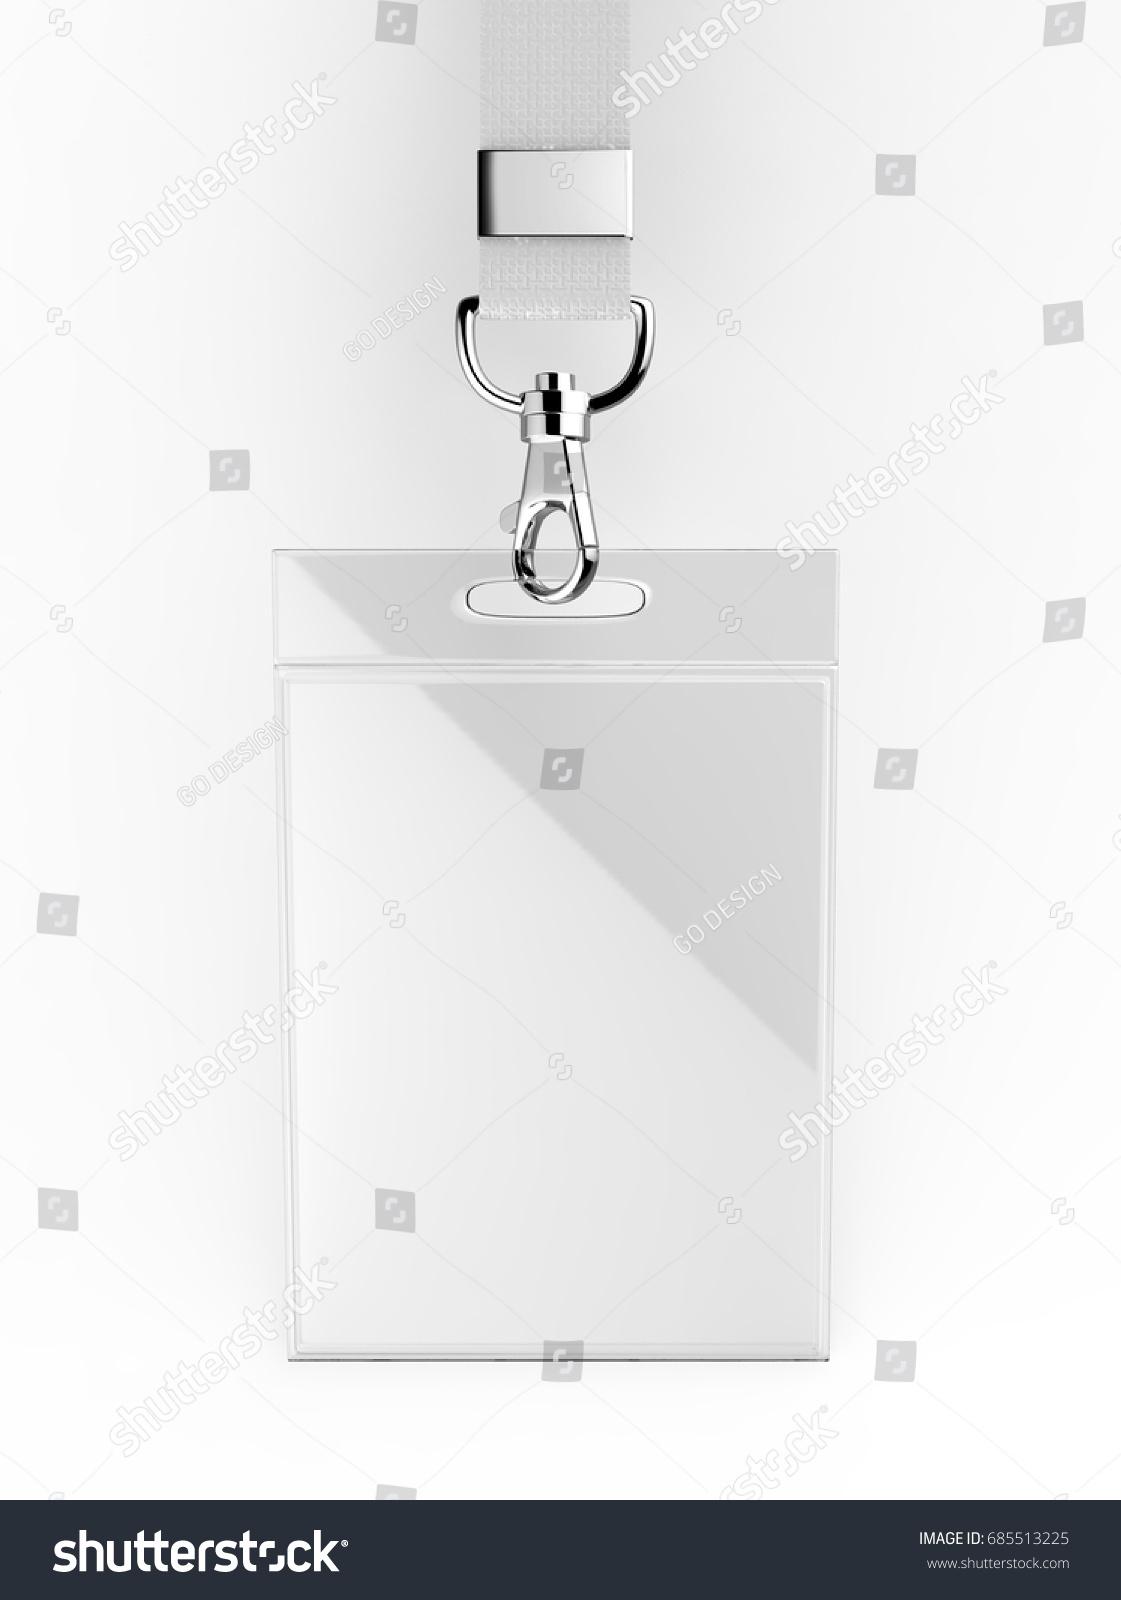 Identification Blank Empty Plastic Id Cards Stock Illustration ...